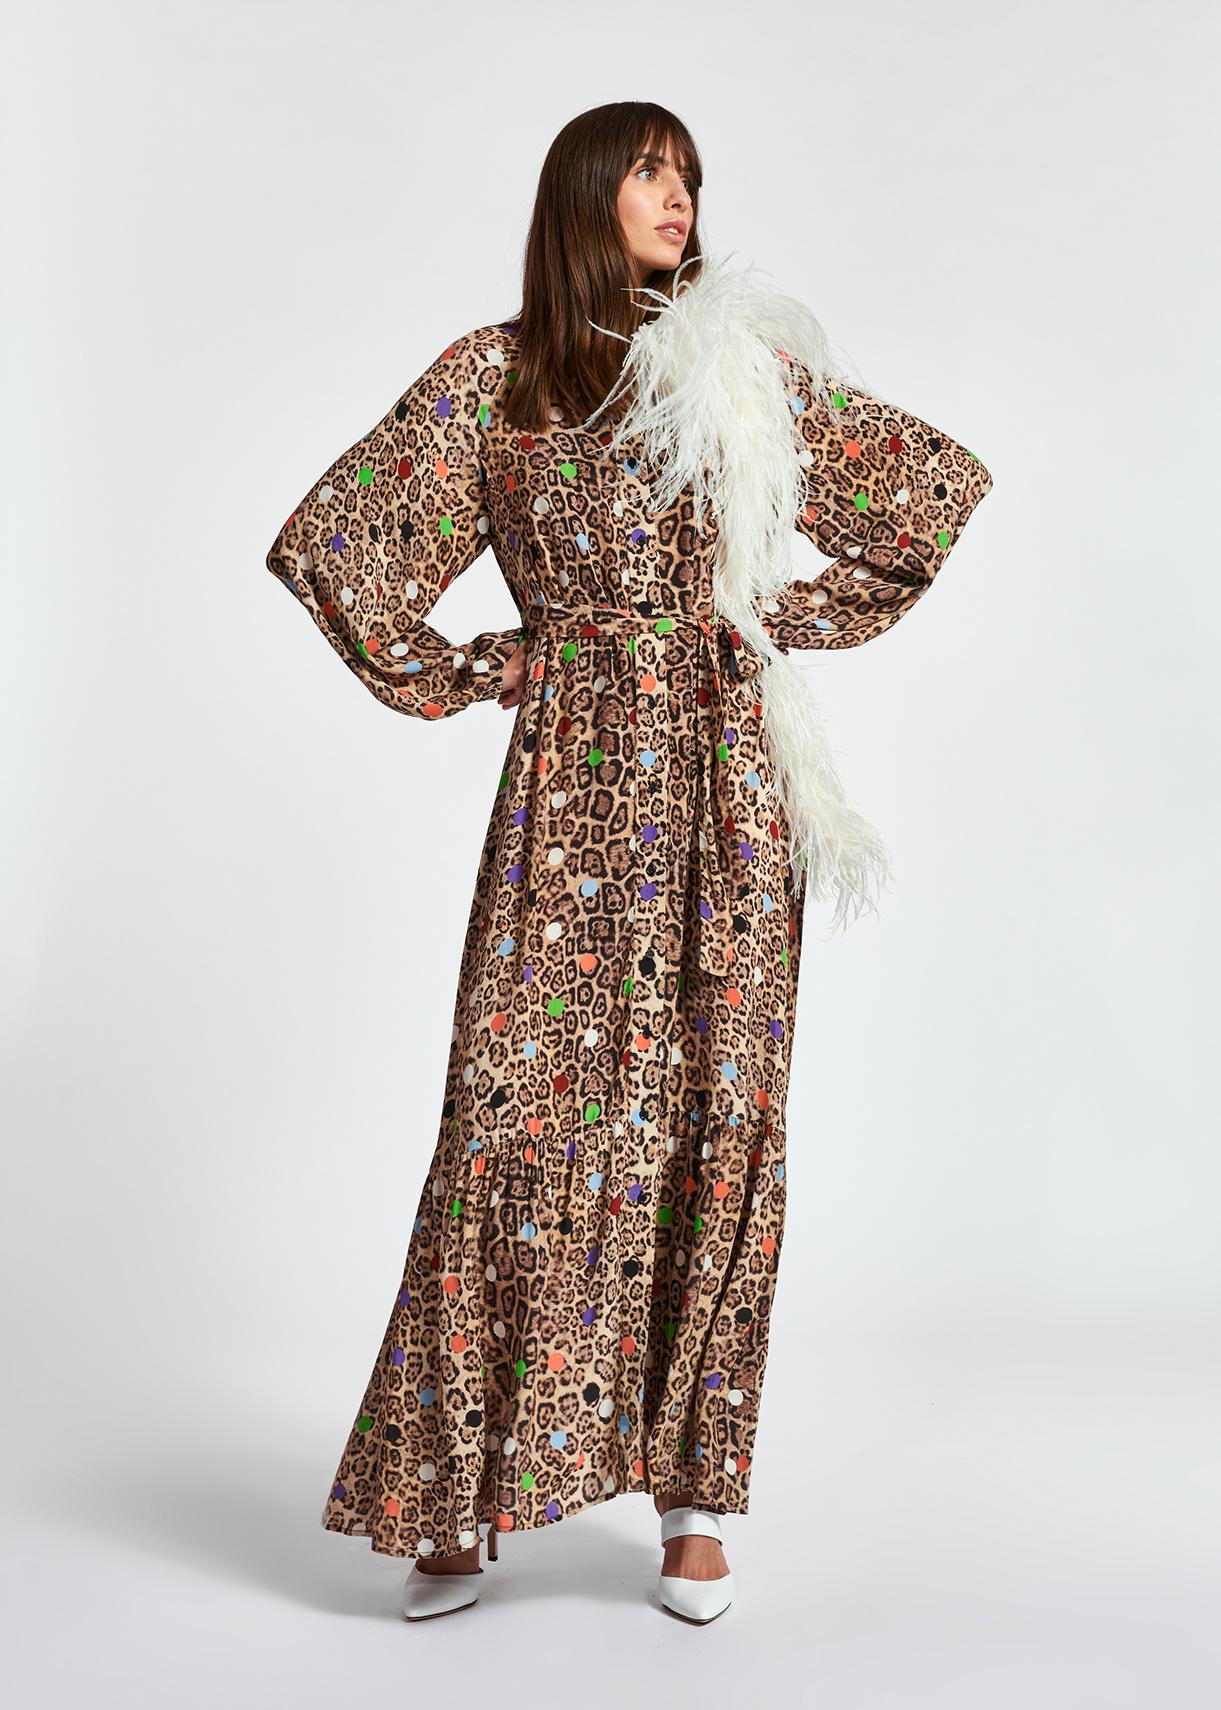 ZEBEL robe-4